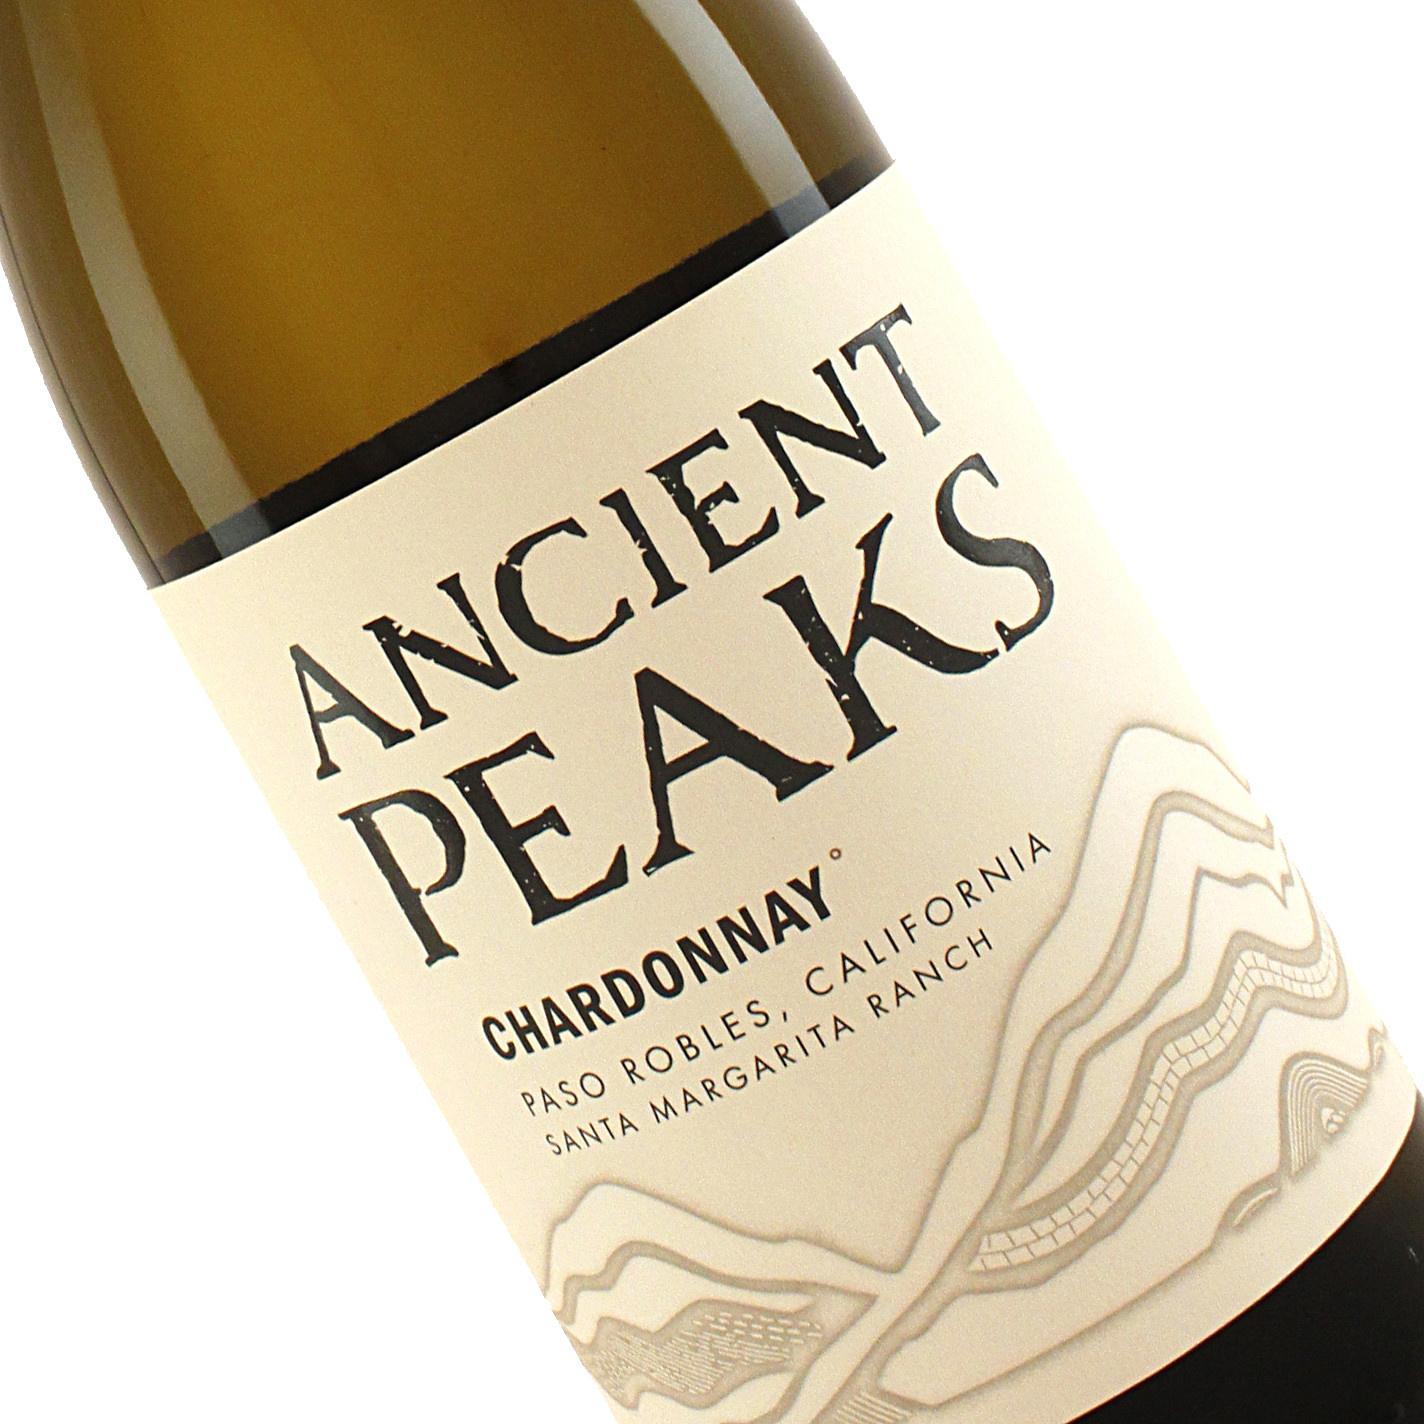 Ancient Peaks 2017 Chardonnay, Paso Robles